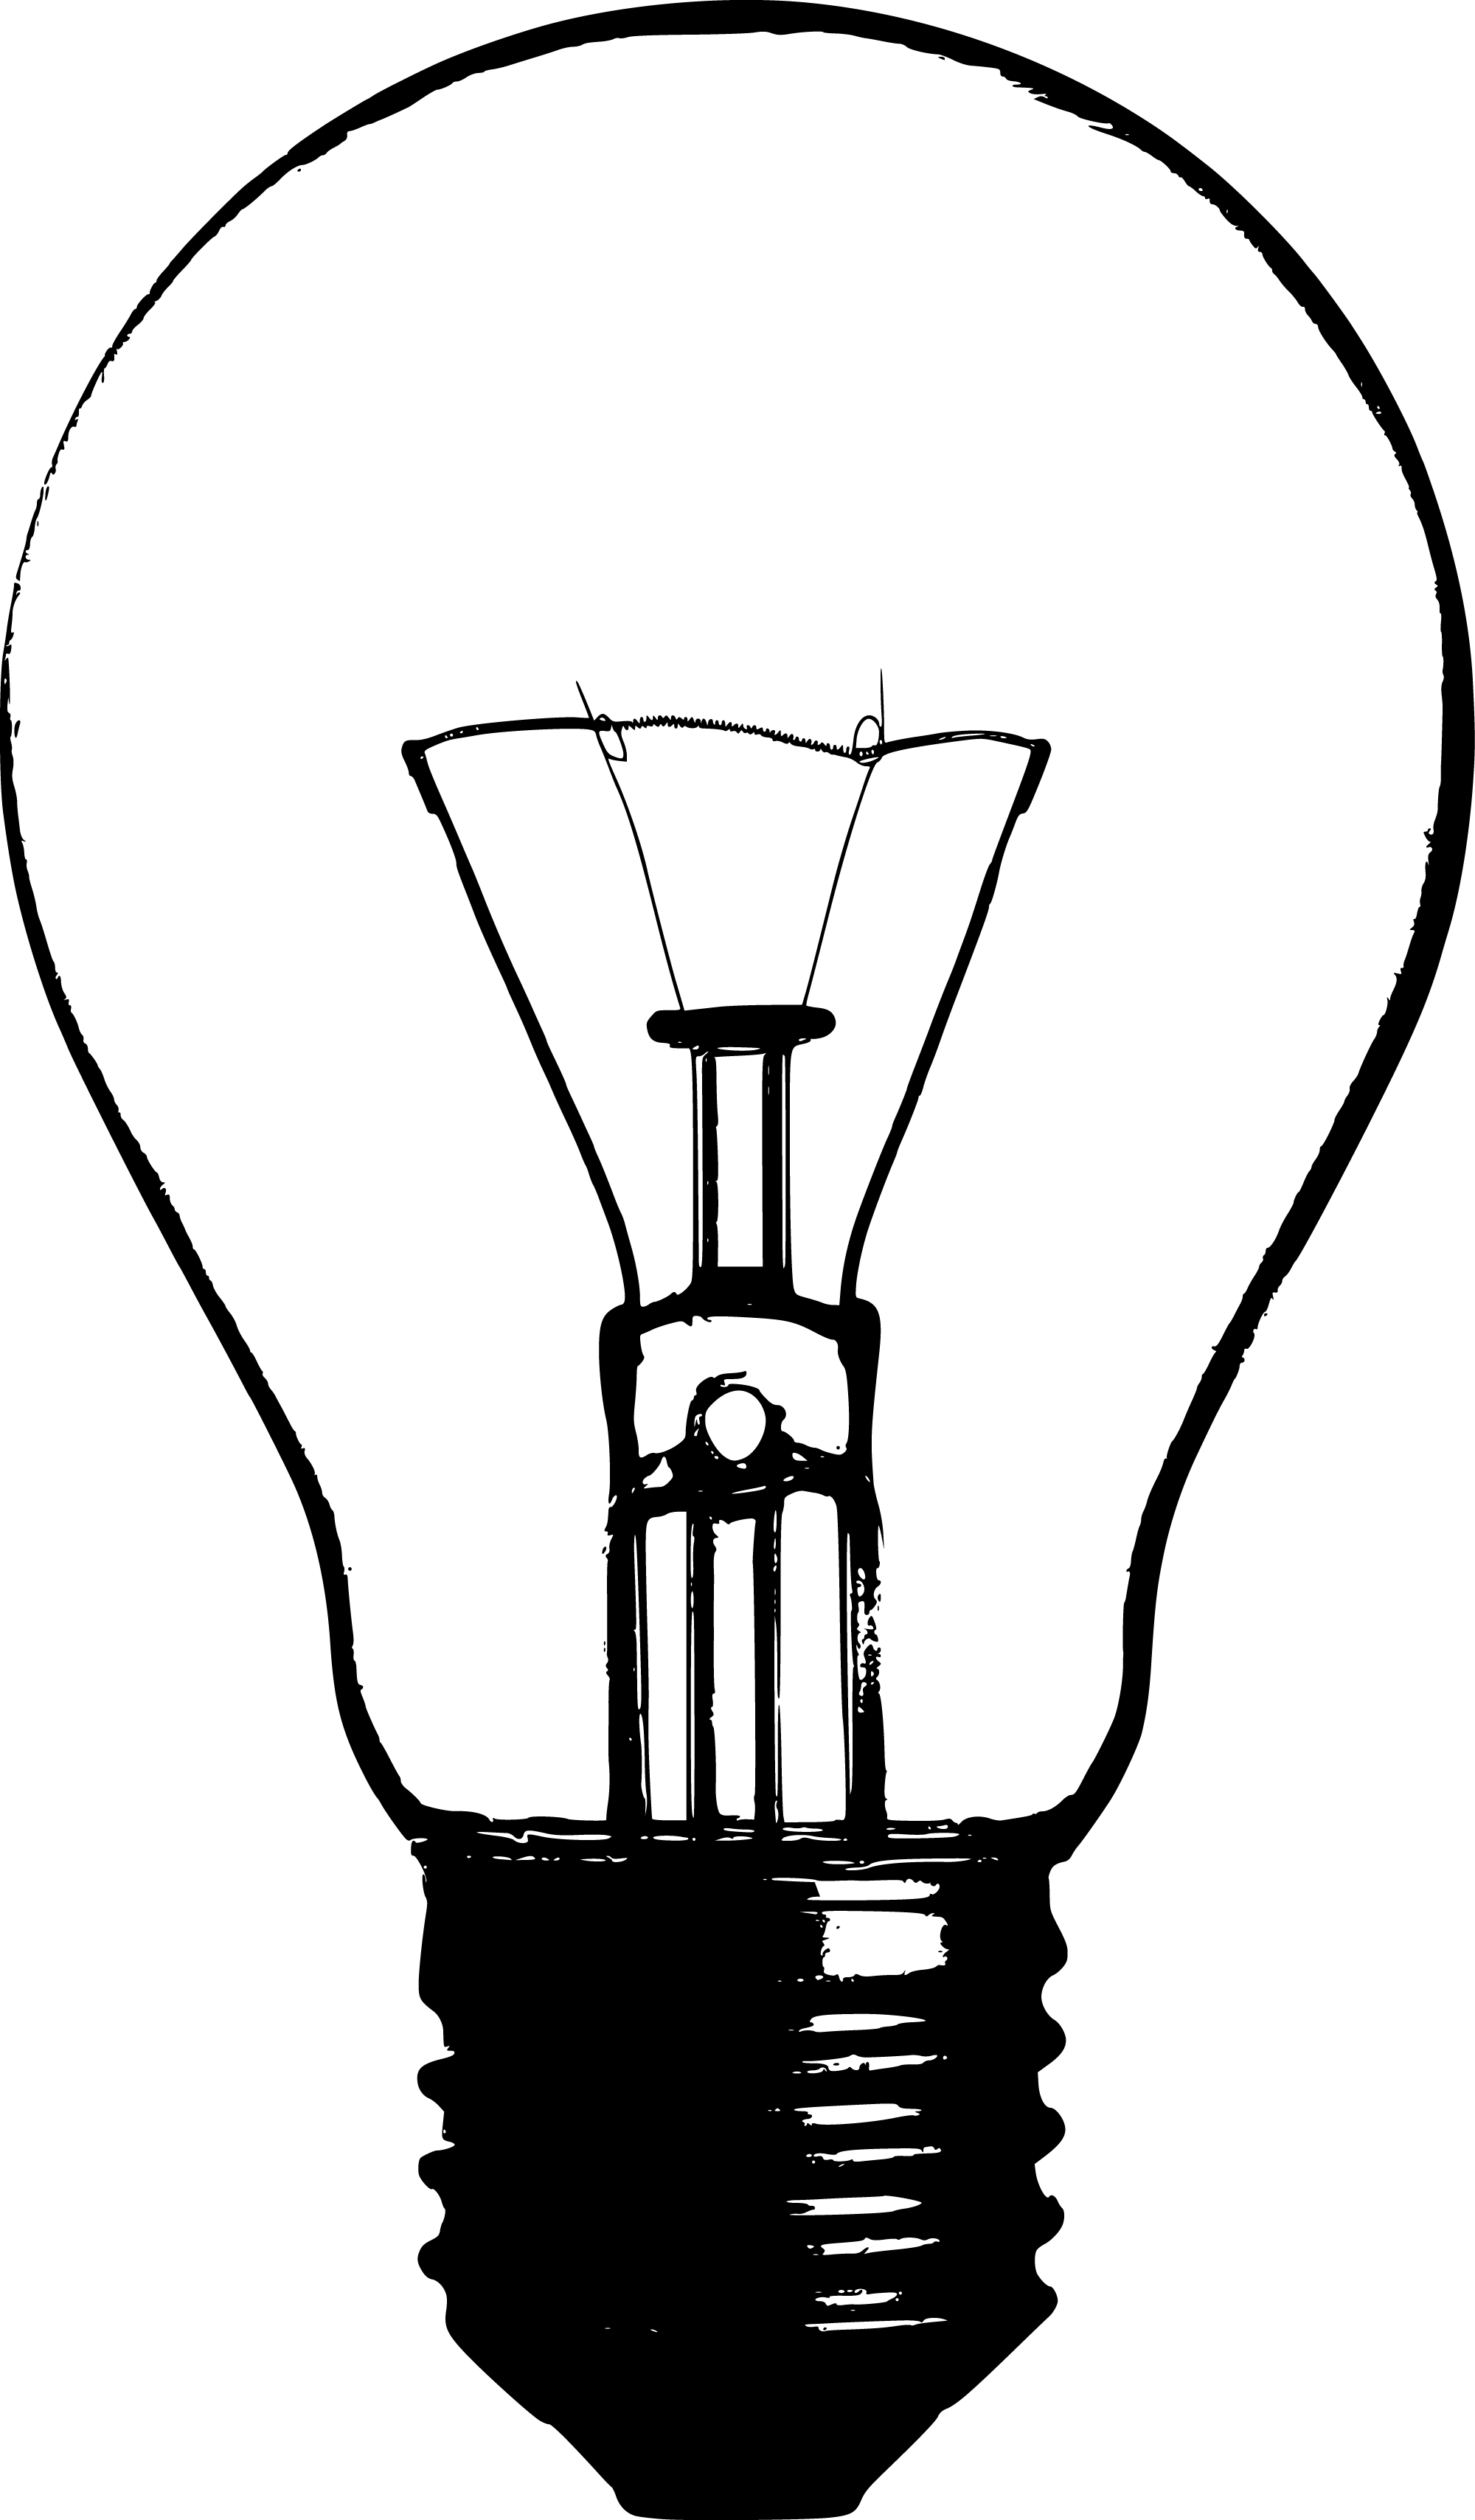 Well I think we found it, Loree McDonald Light bulb art